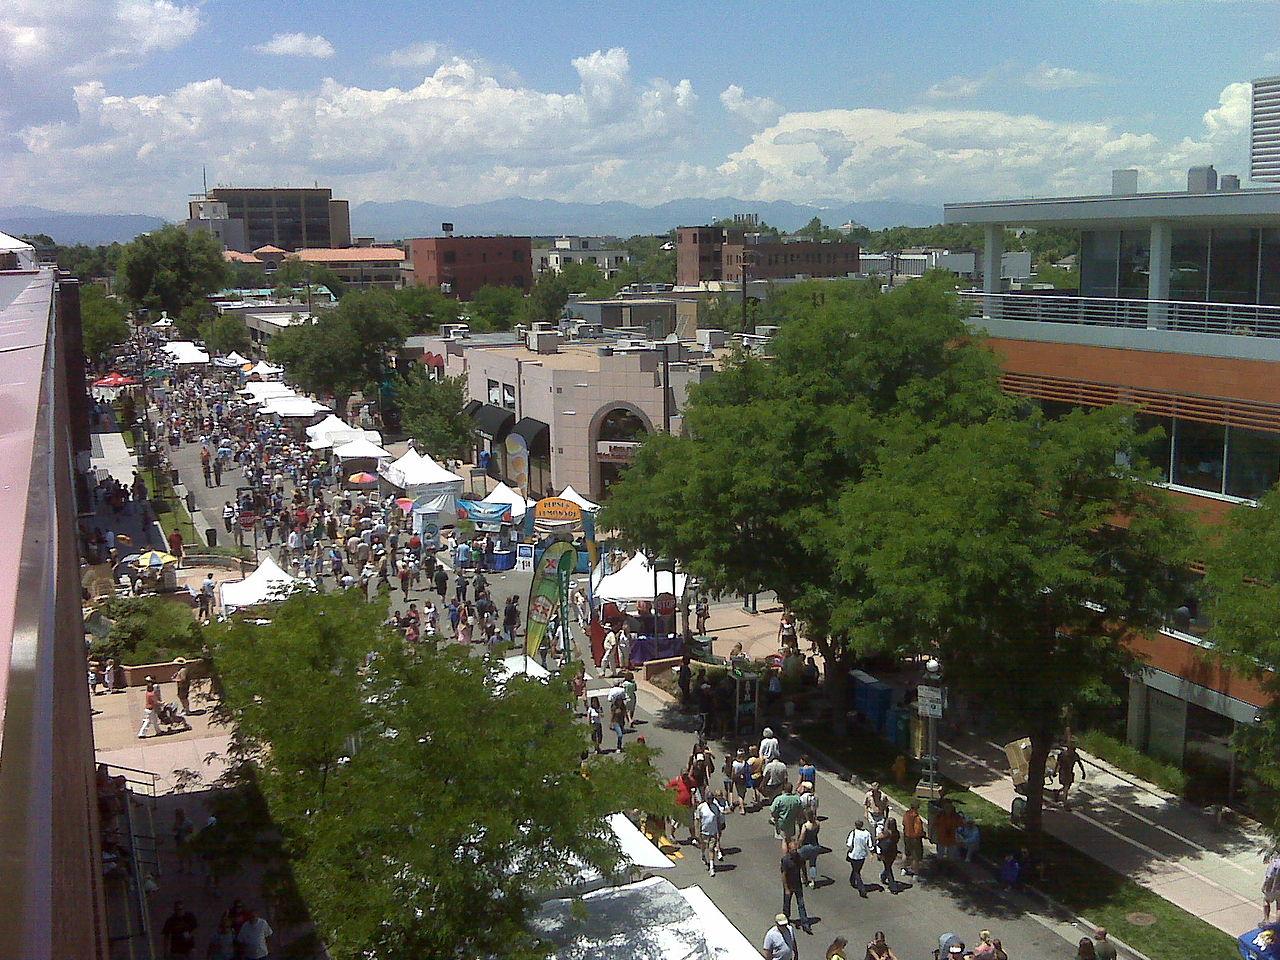 Cherry Creek Festival